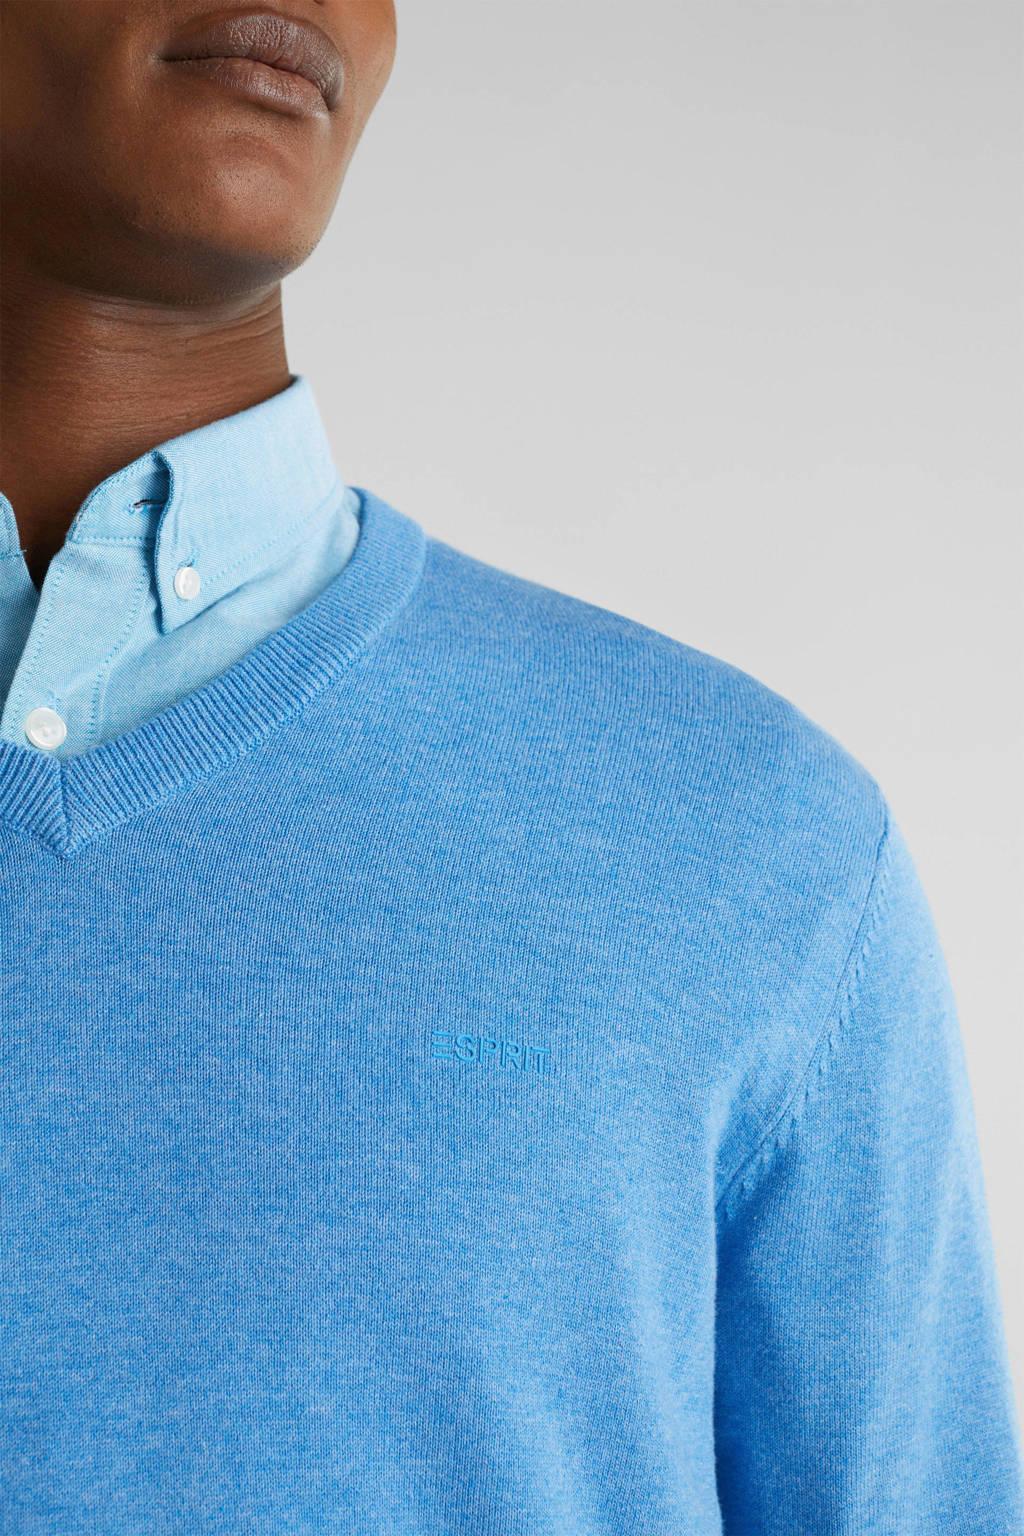 ESPRIT Men Casual sweater bright blue, Bright Blue